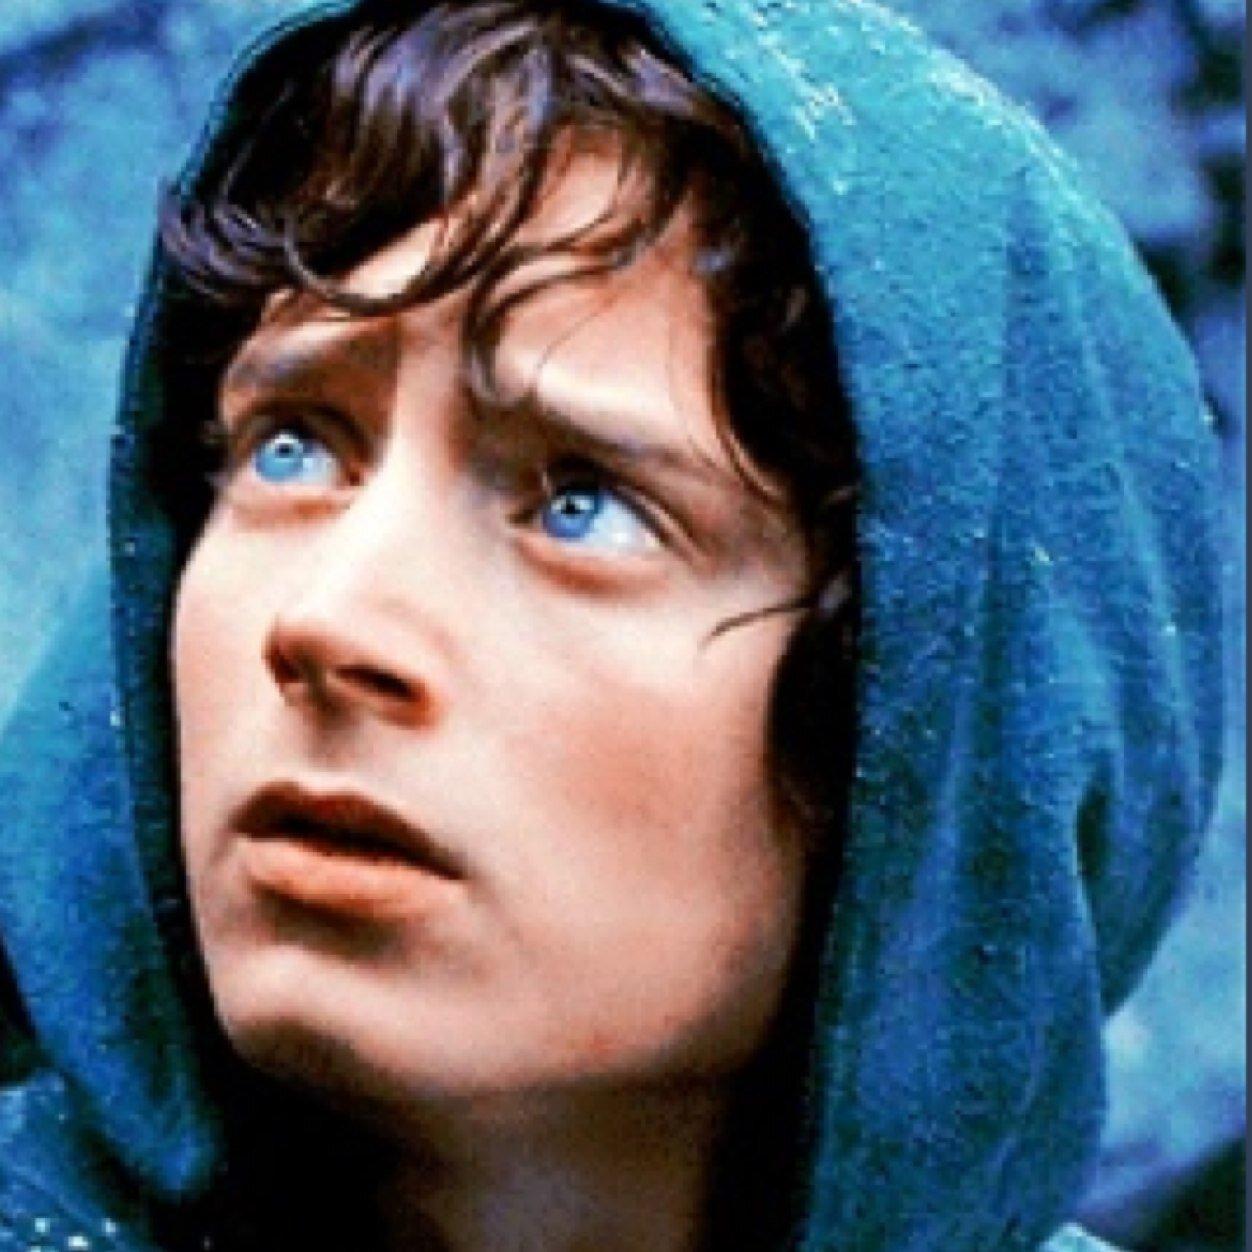 Frodo baggins frodo onering twitter for Pics of frodo baggins